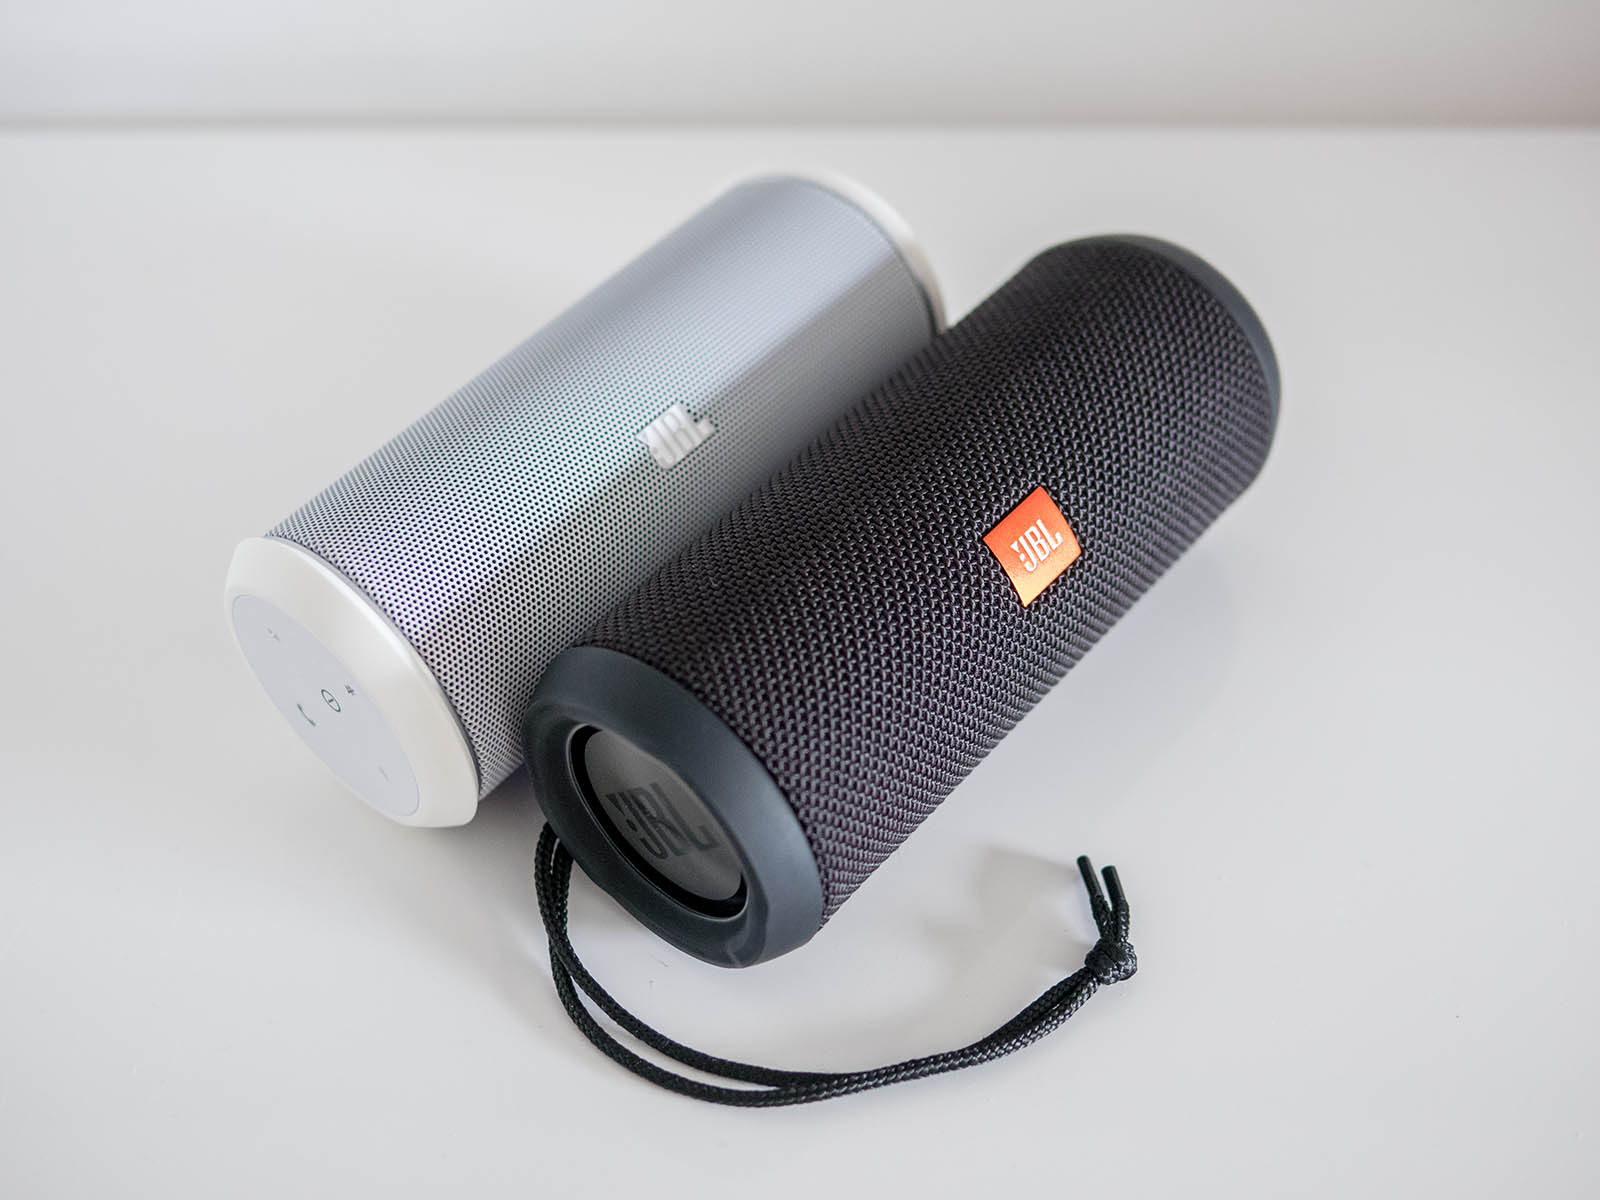 jbl speakers amazon. review: jbl flip 3 - the ue boom killer jbl speakers amazon h